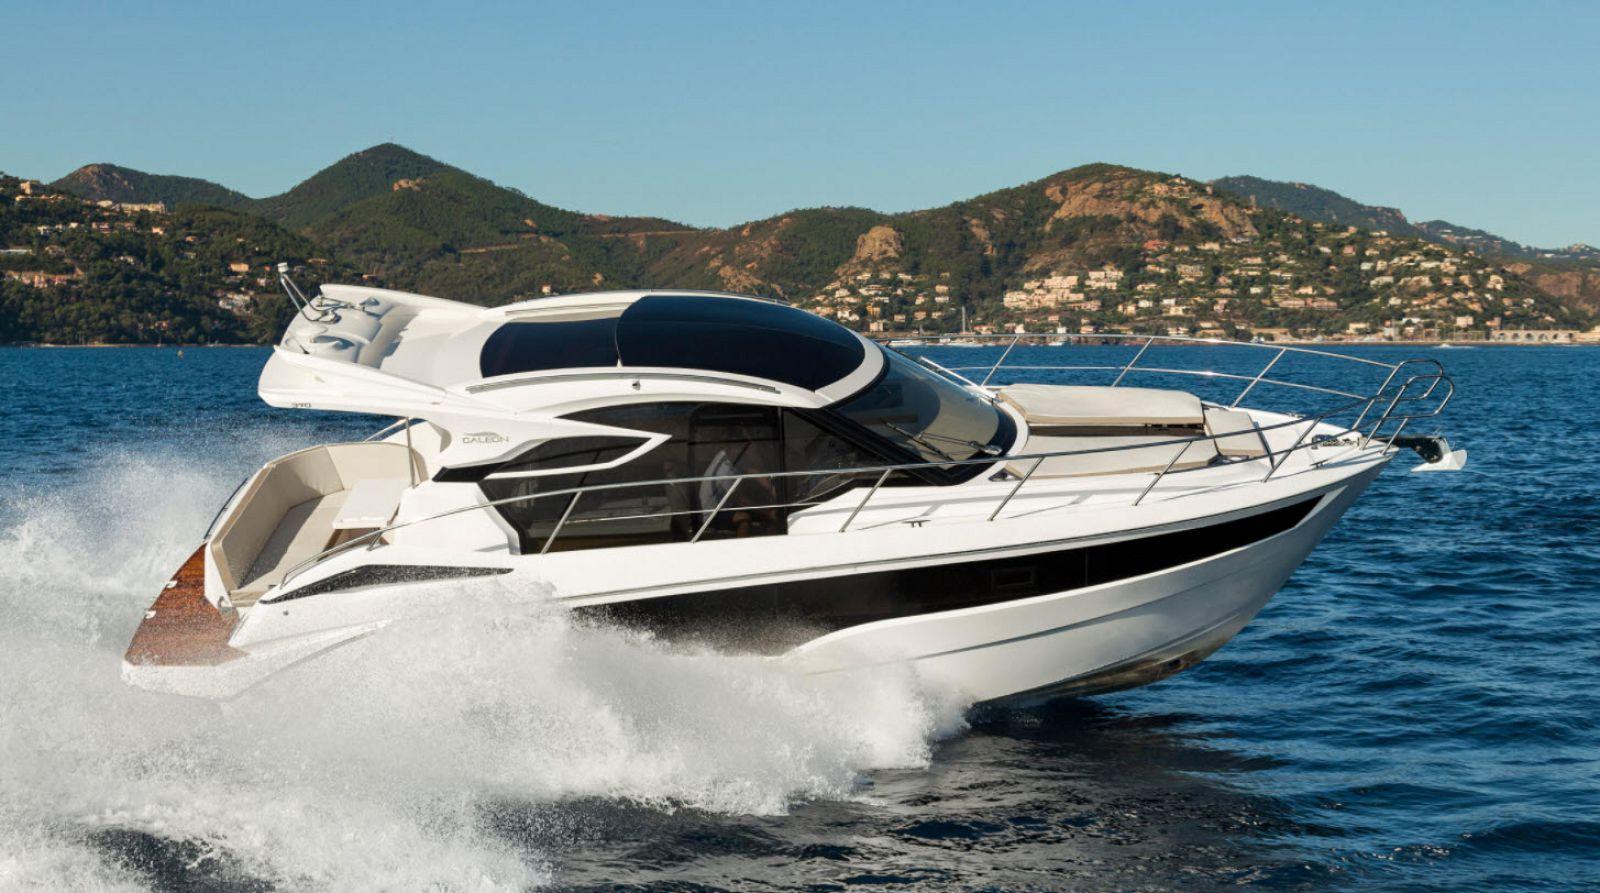 galeon 370 htc yacht